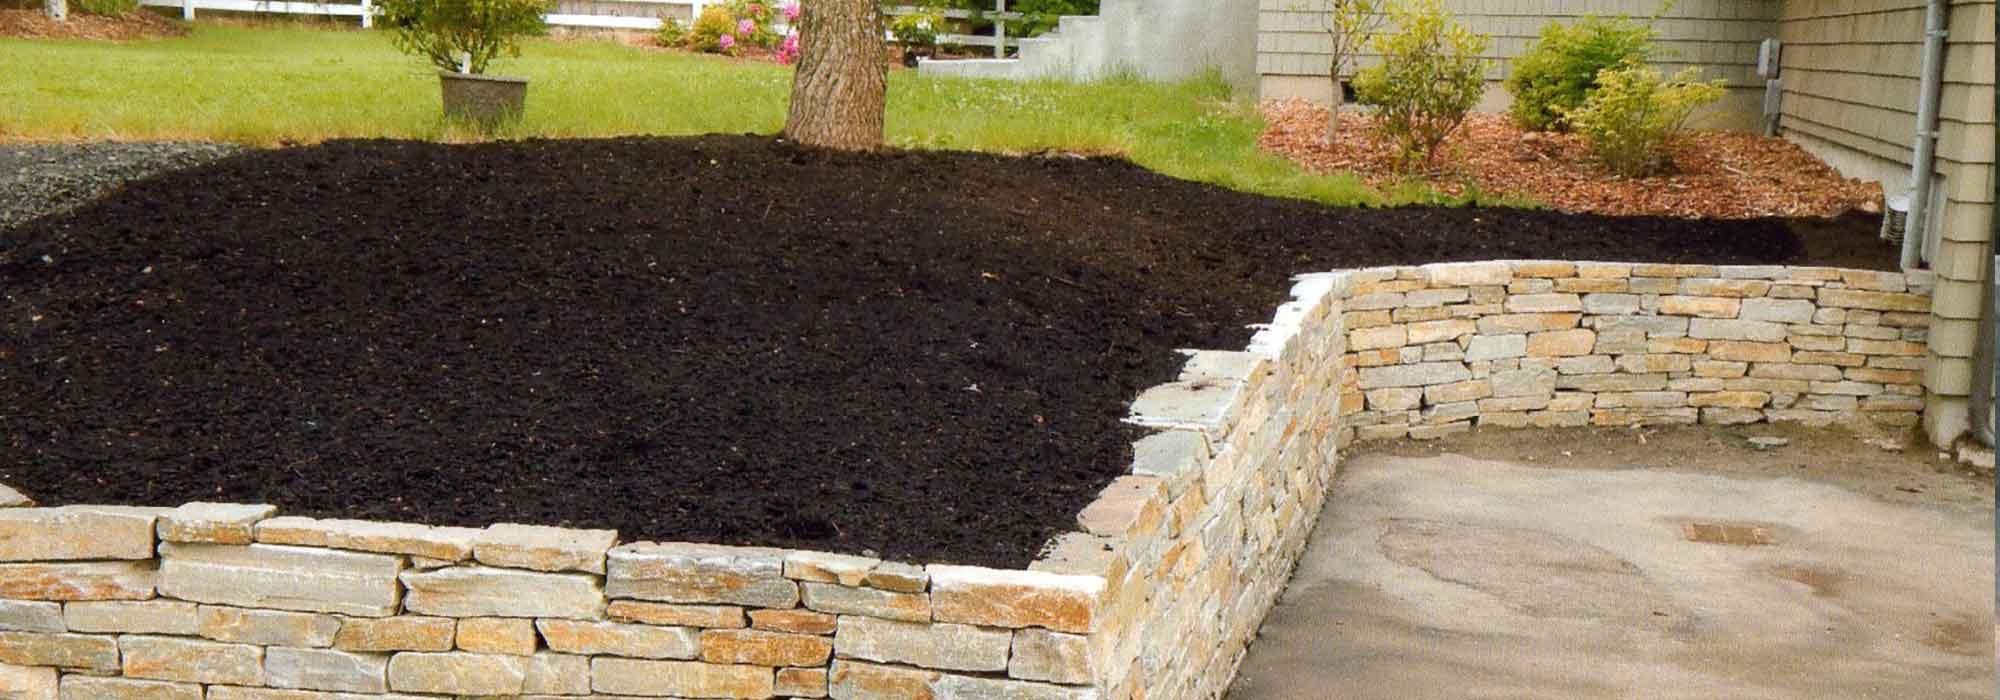 Indigo Topsoil Soil Bark